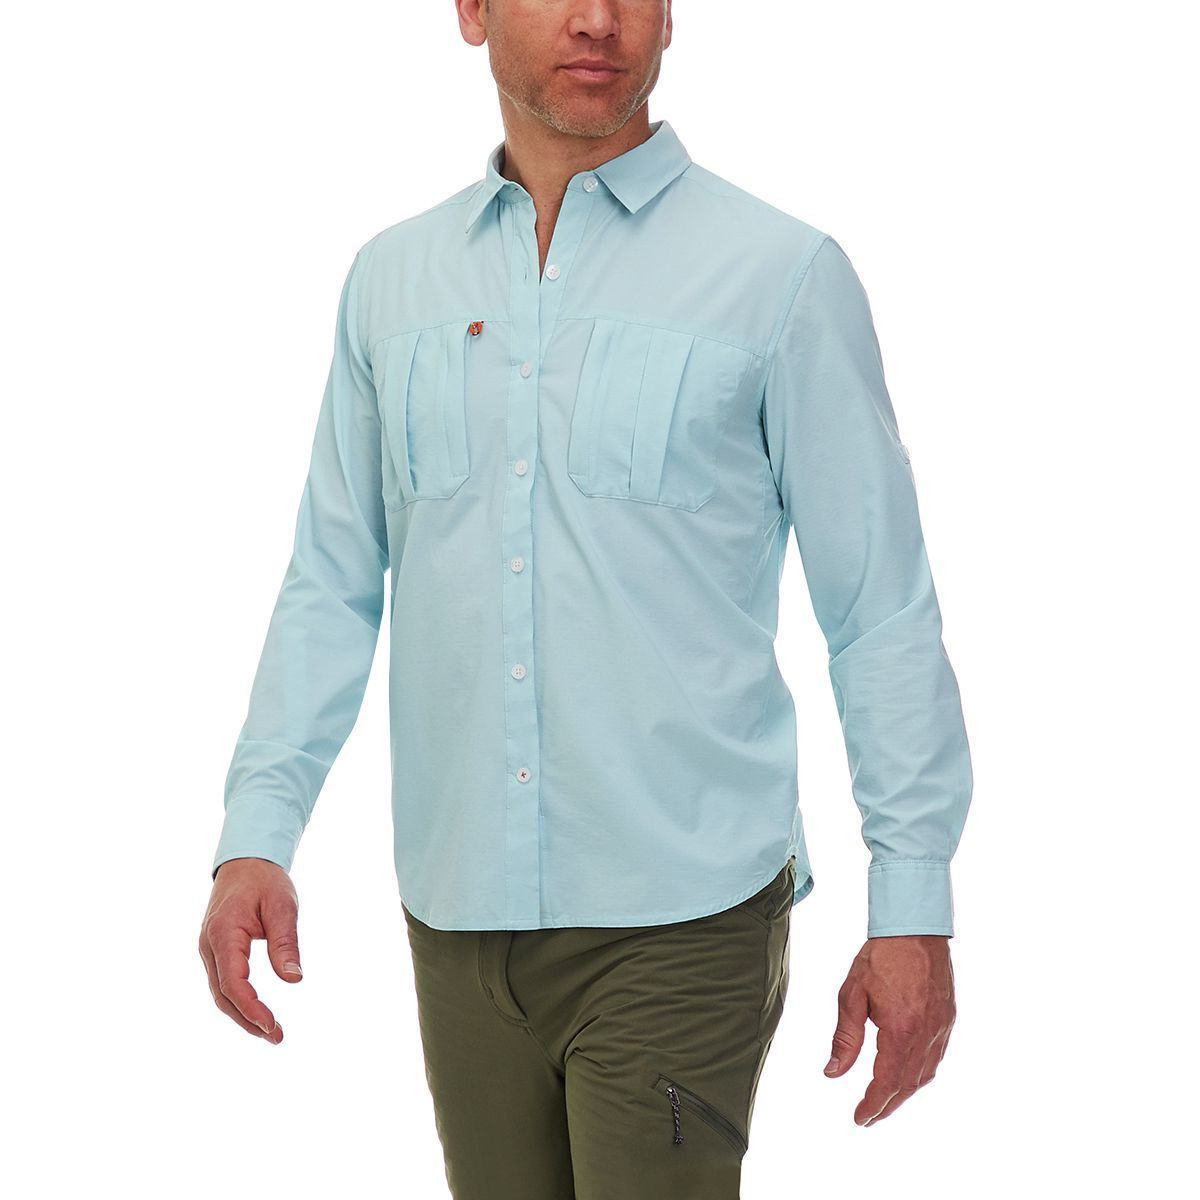 Basin and Range Provo River Sun Shirt - Men's